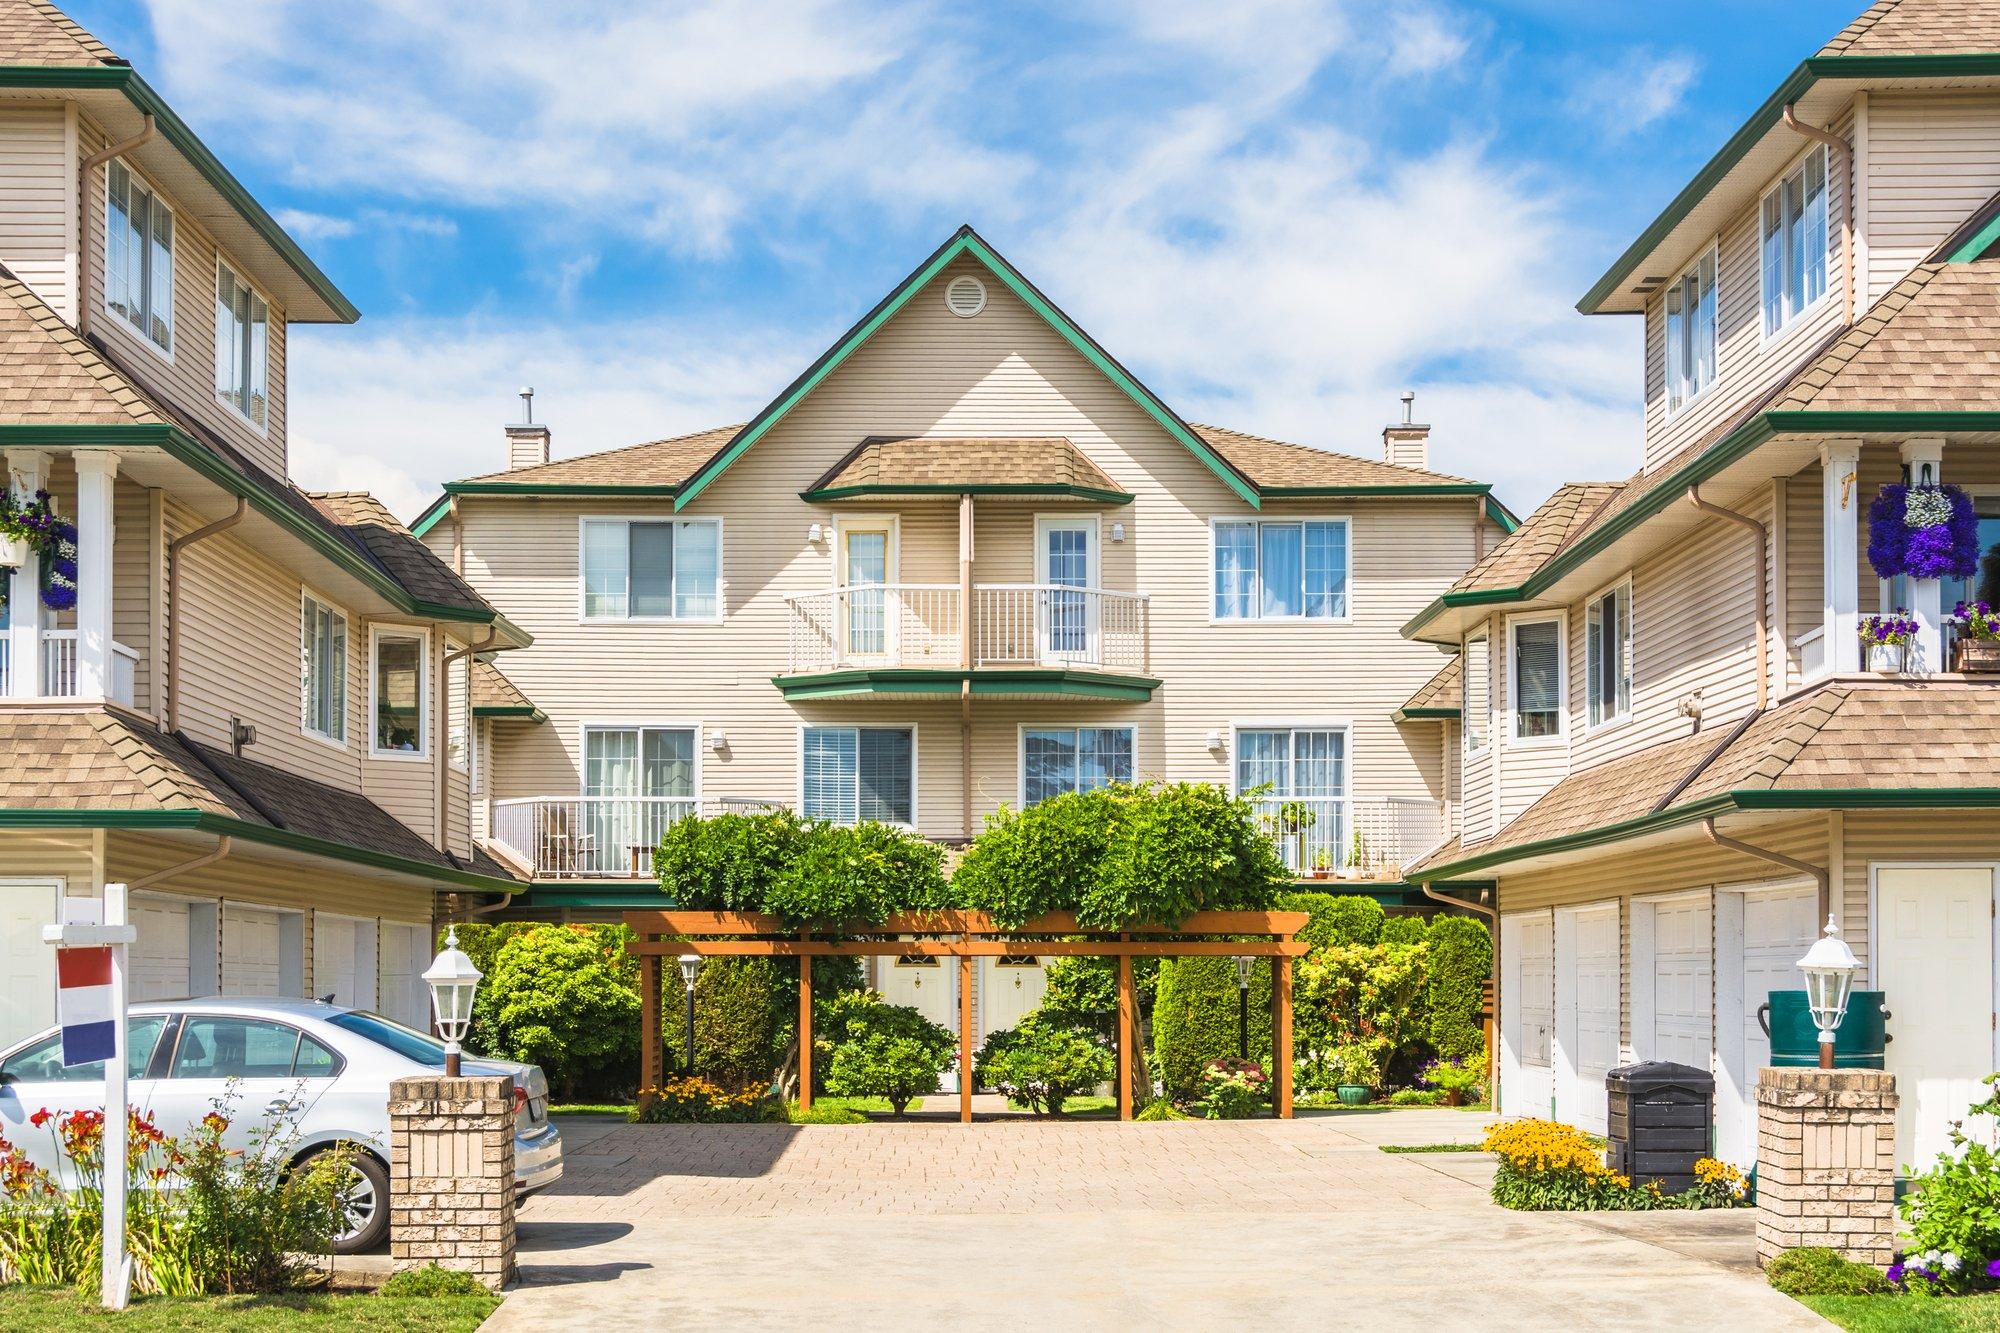 Neighbourhood of multifamily properties